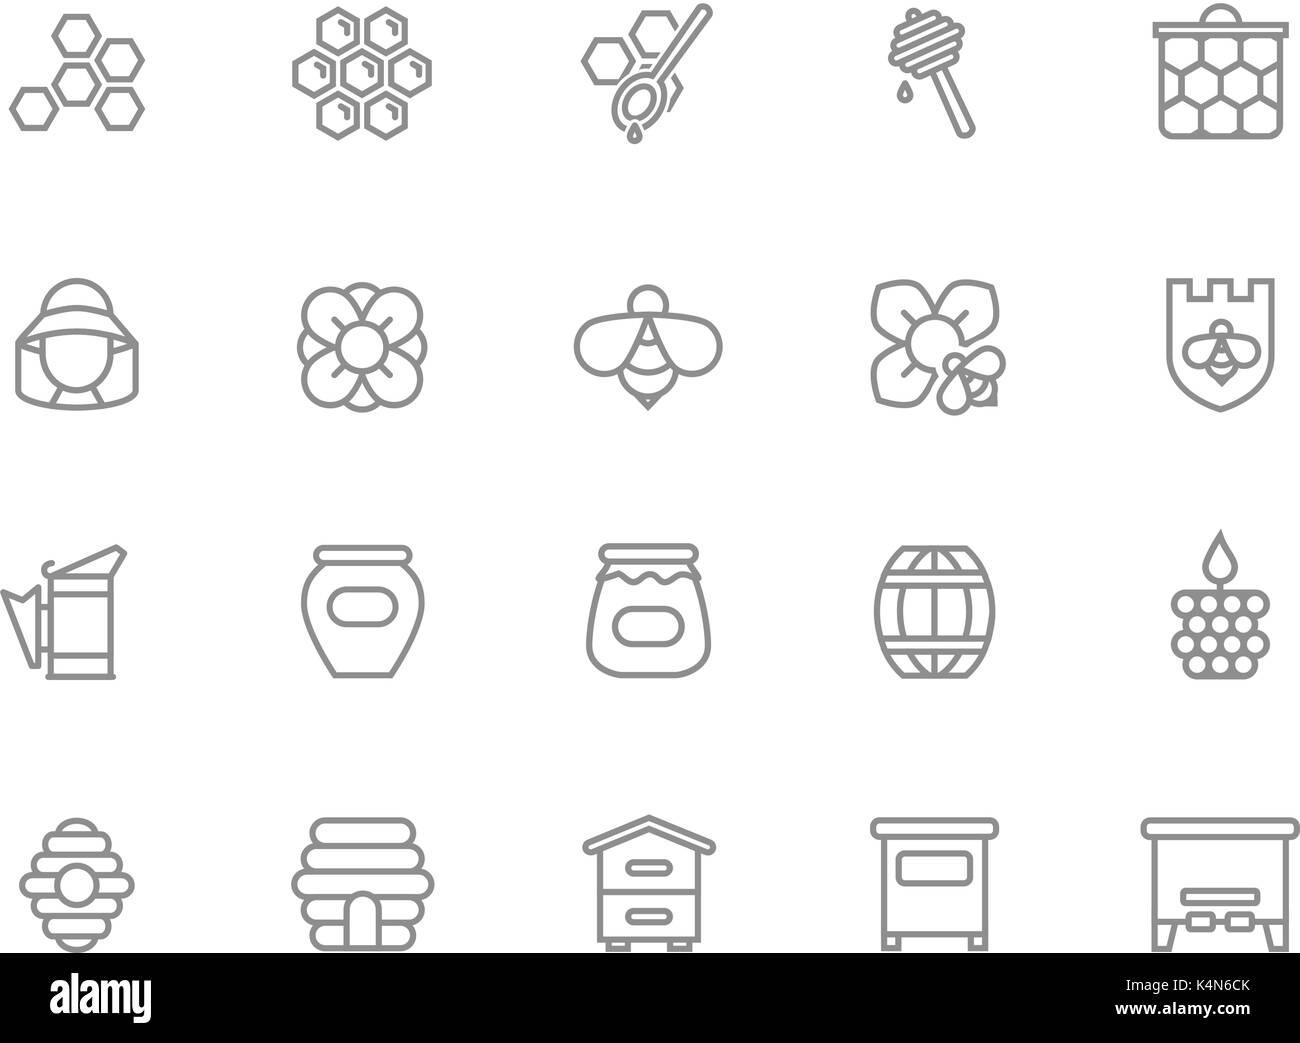 Set of vector honey line icons. Bee, honeycomb, barrel, beekeeper, dipper, jar, flower, beehive, pot, hexagon, beeswax, spoon and more. Editable Stroke. - Stock Image